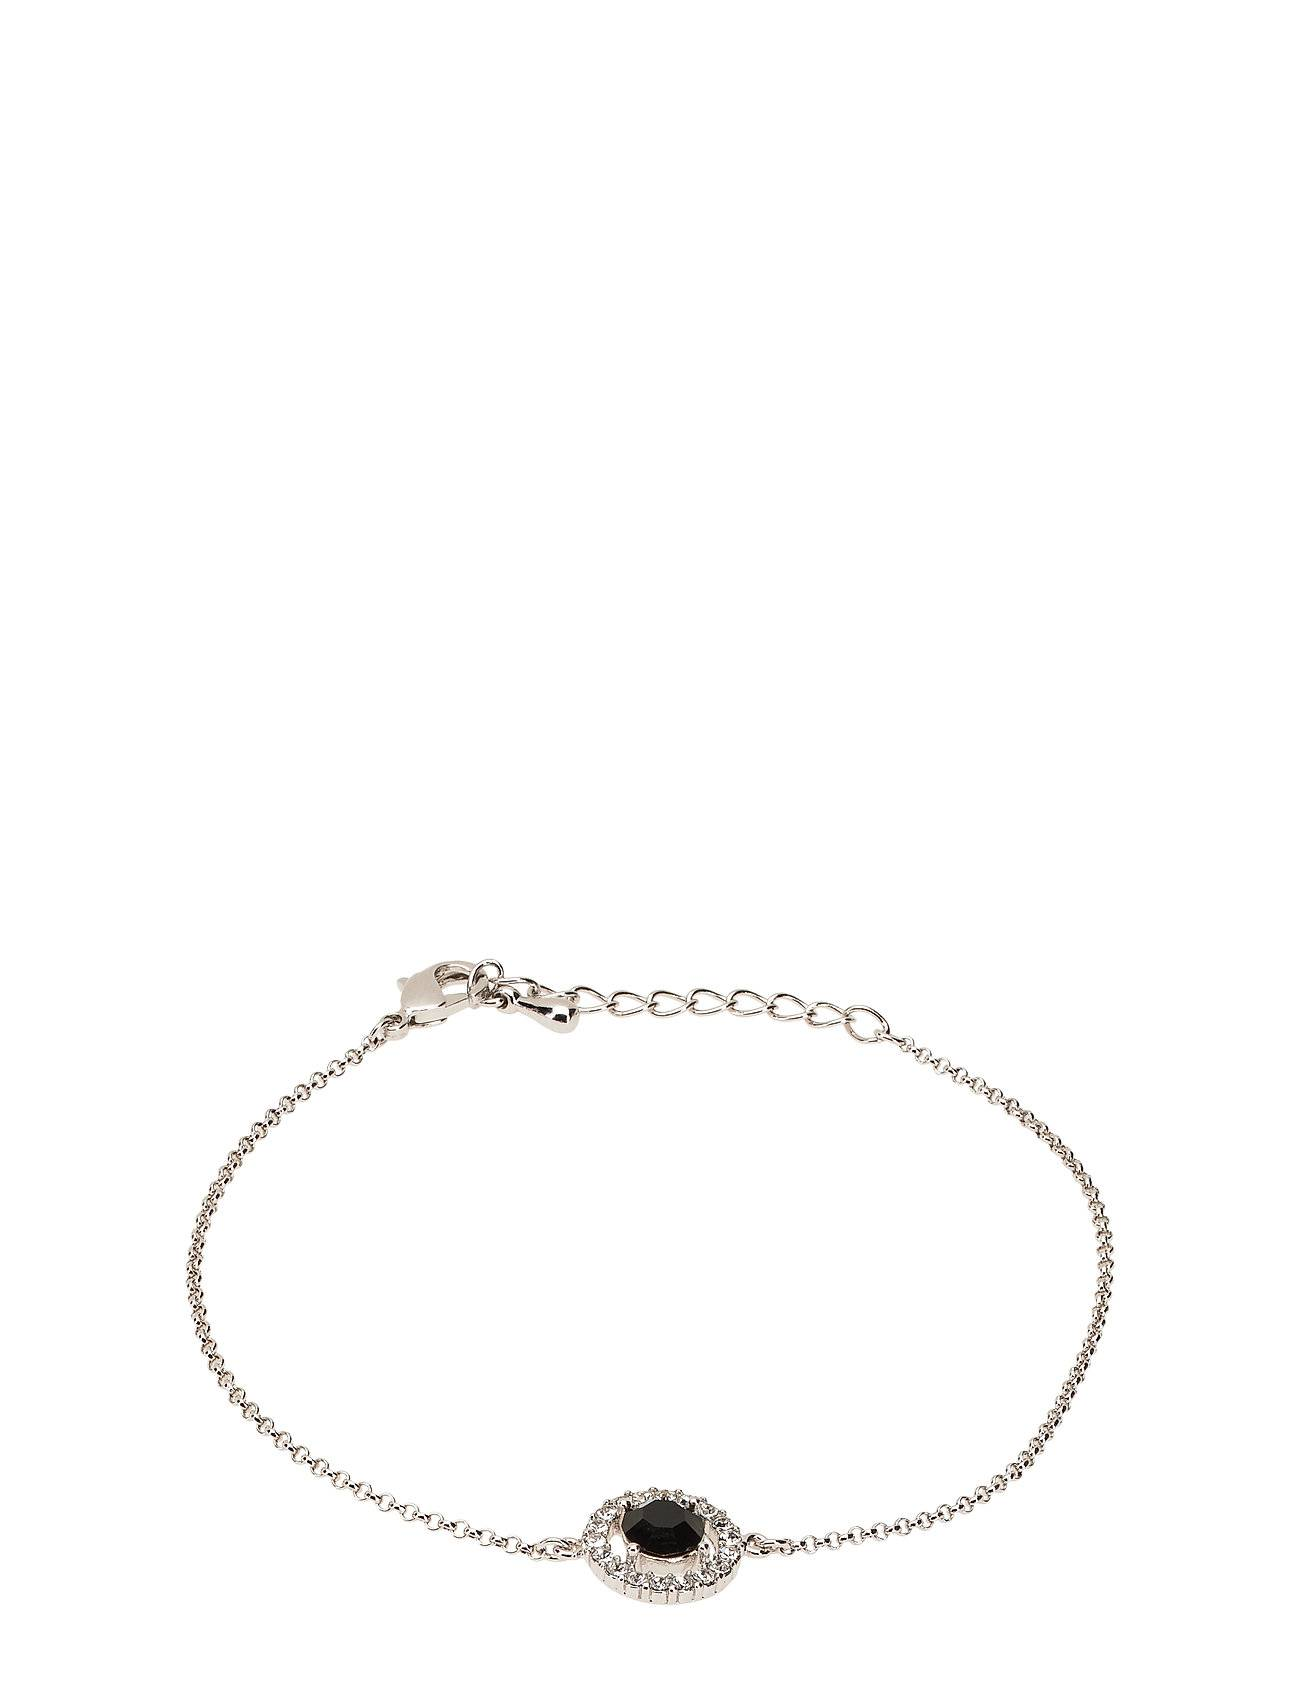 LILY AND ROSE Miss Miranda Bracelet - Jet Accessories Jewellery Bracelets Chain Bracelets Musta LILY AND ROSE